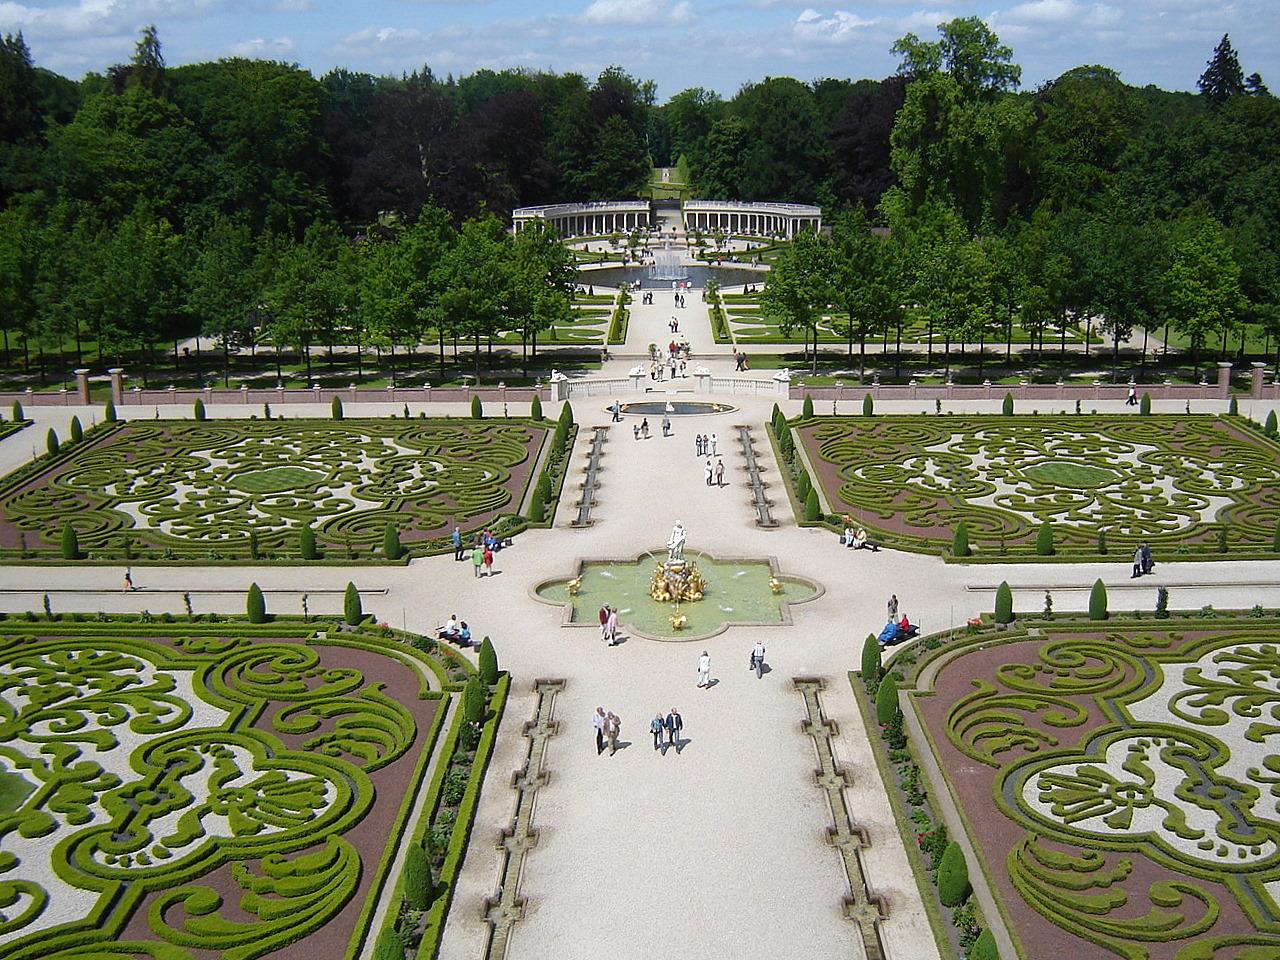 Fullsize Of Royal Dutch Gardens